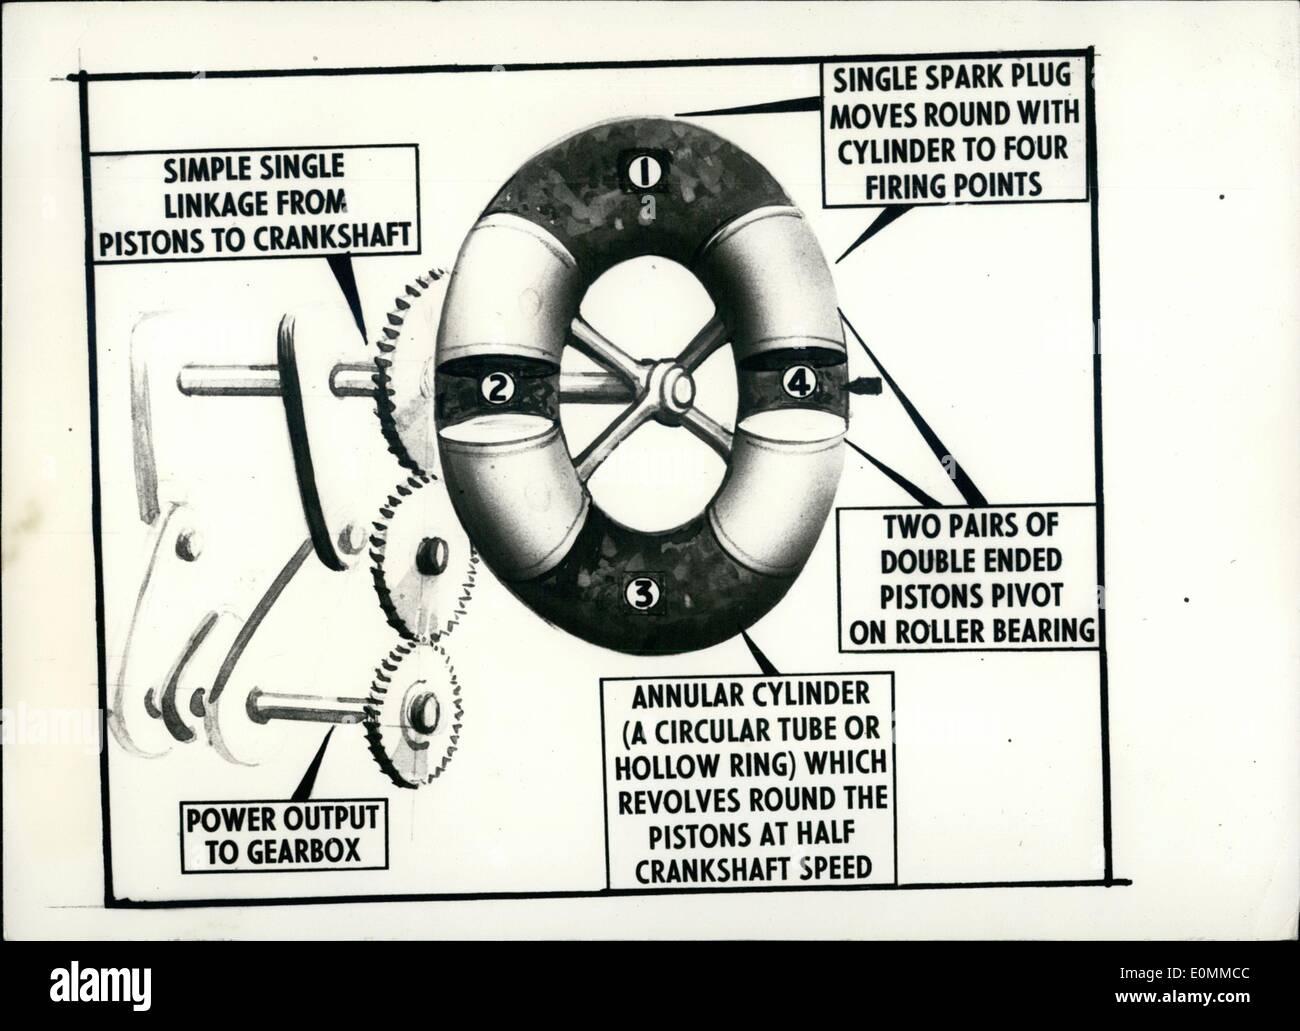 Engine Gear Stockfotos & Engine Gear Bilder - Alamy